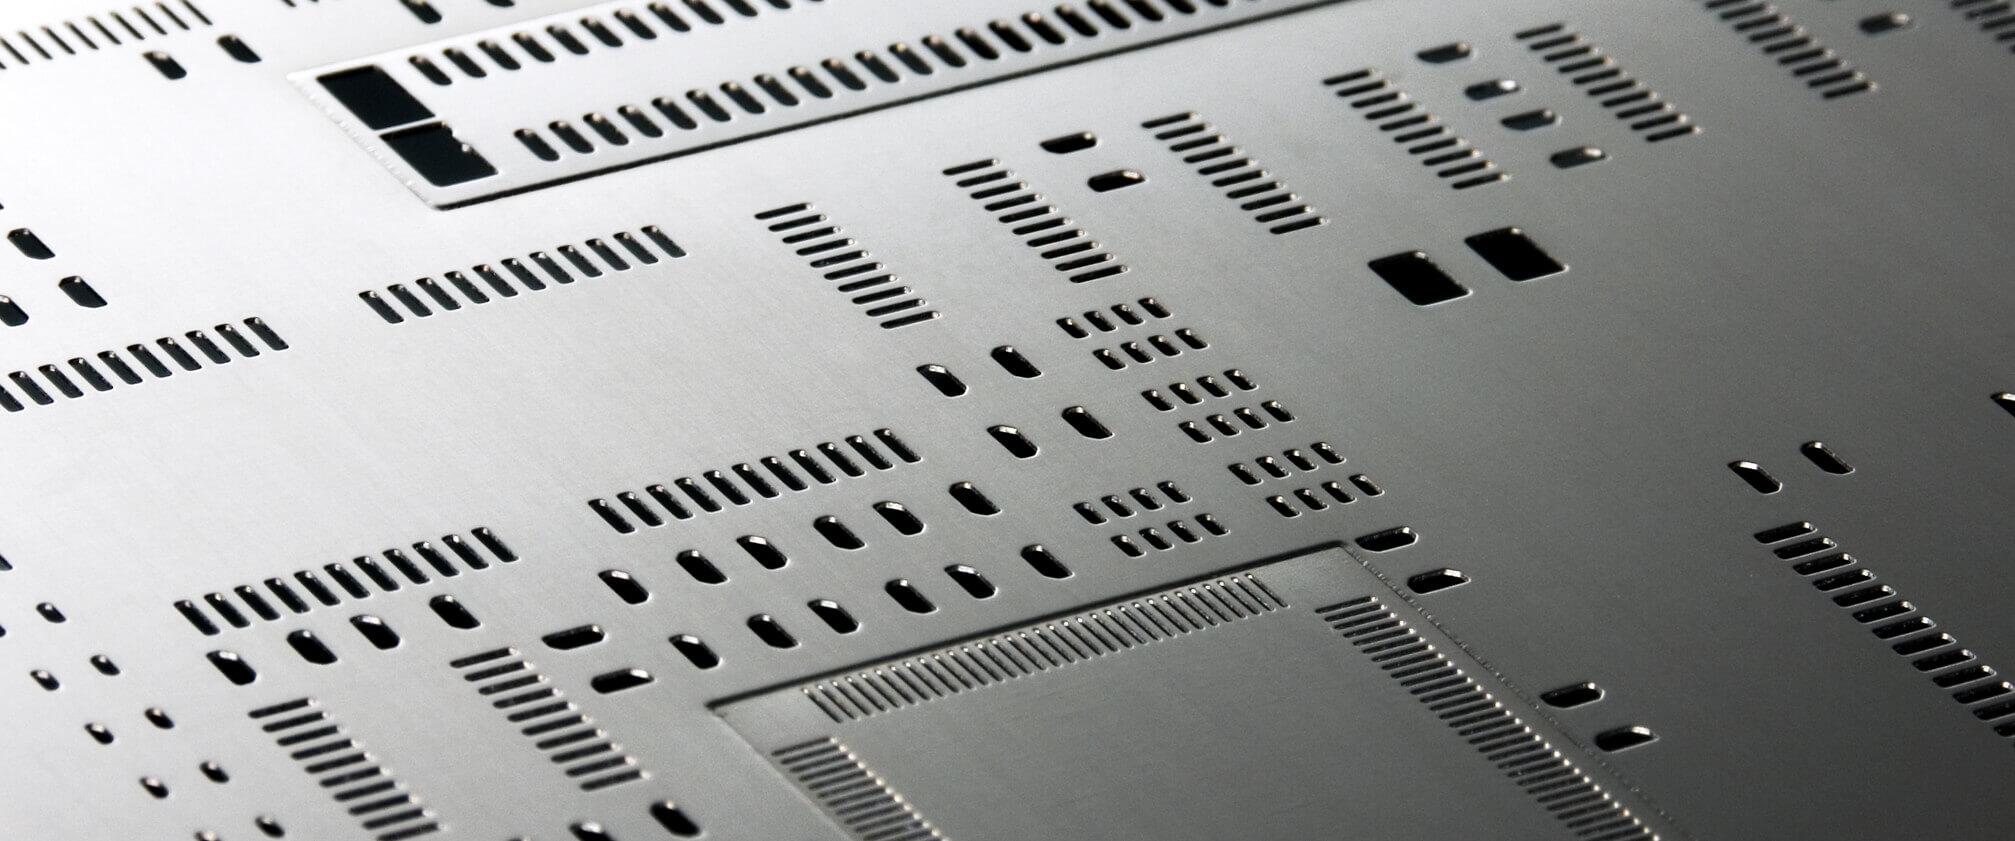 Laser cut step stencil - LaserJob